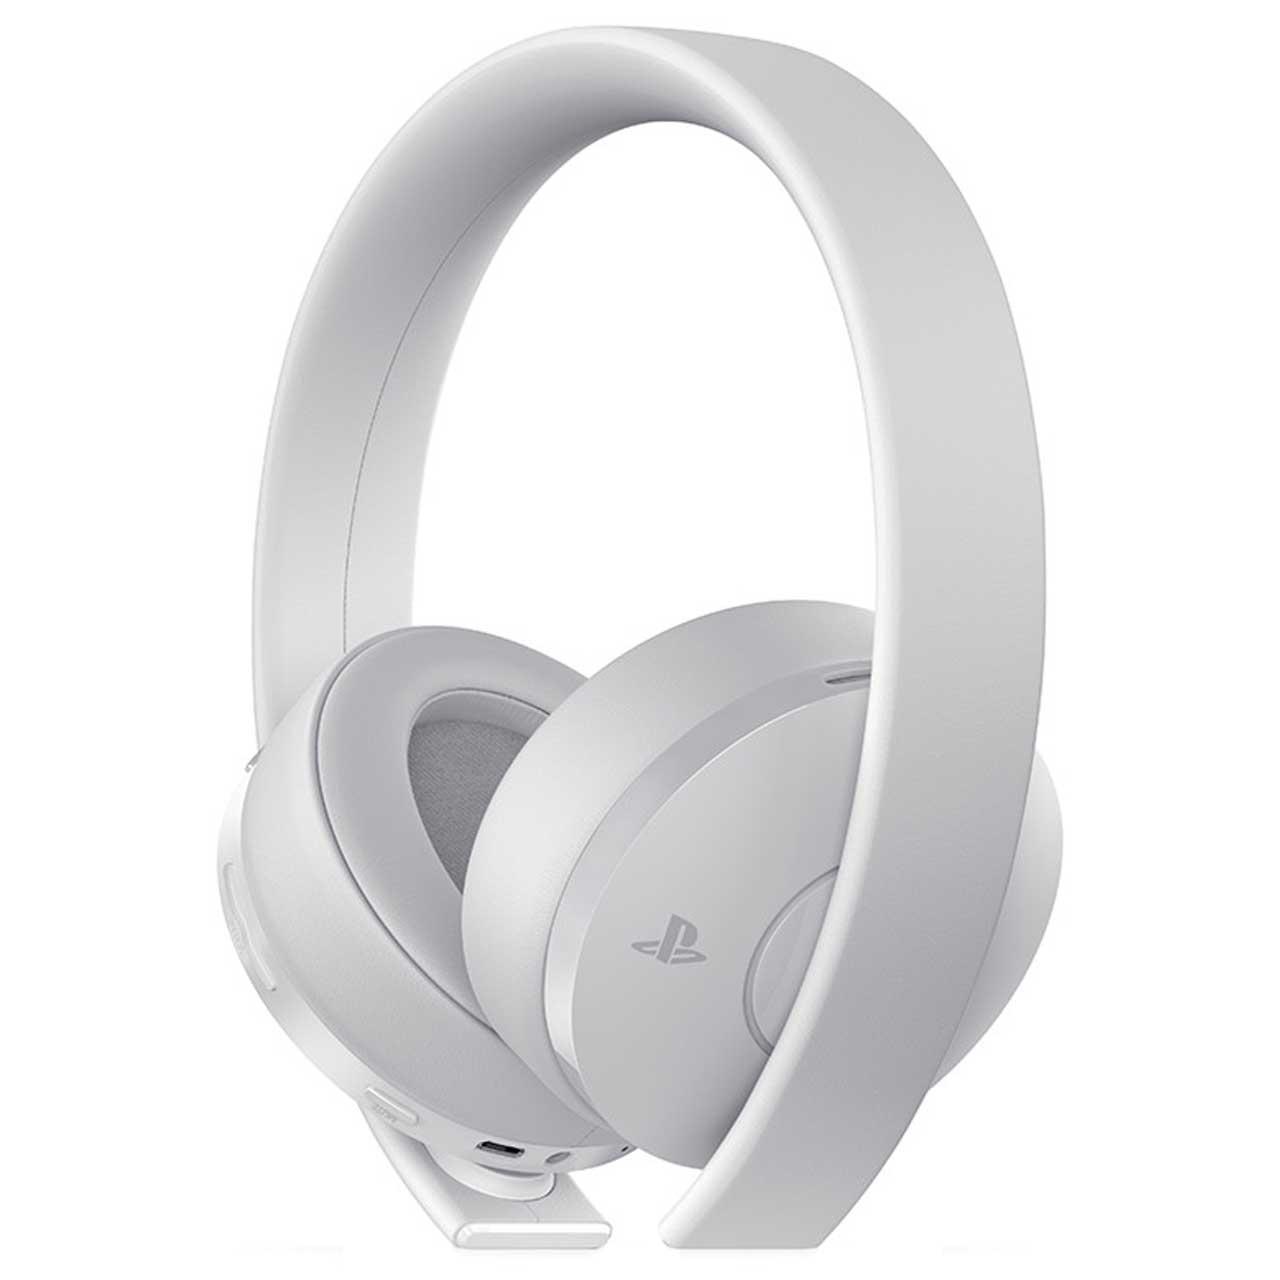 عکس هدست سونی مدل headset new gold white